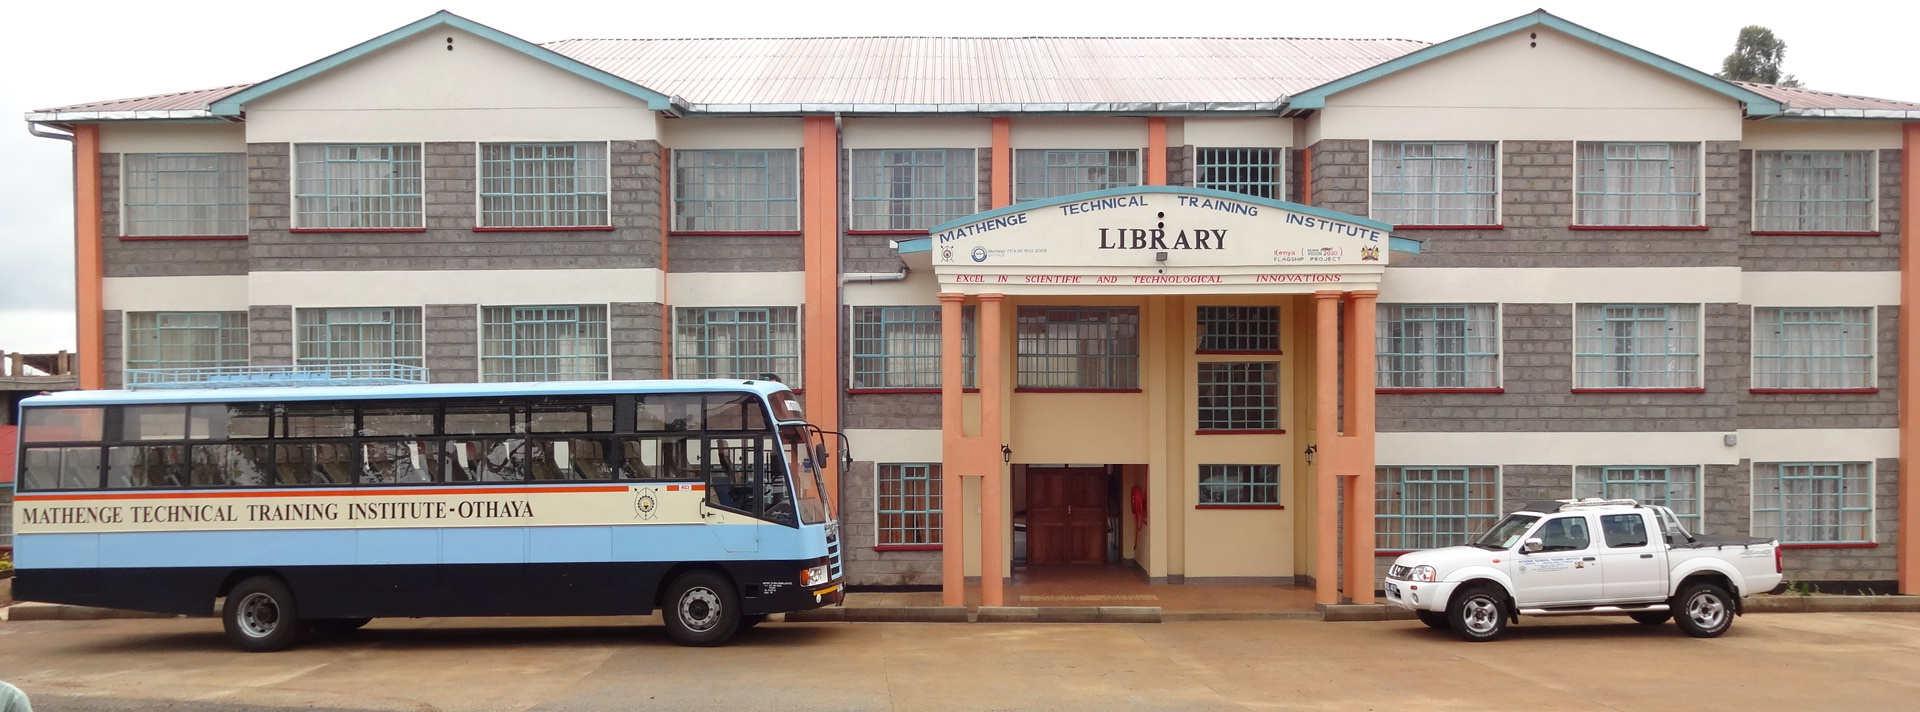 mathenge technical institute